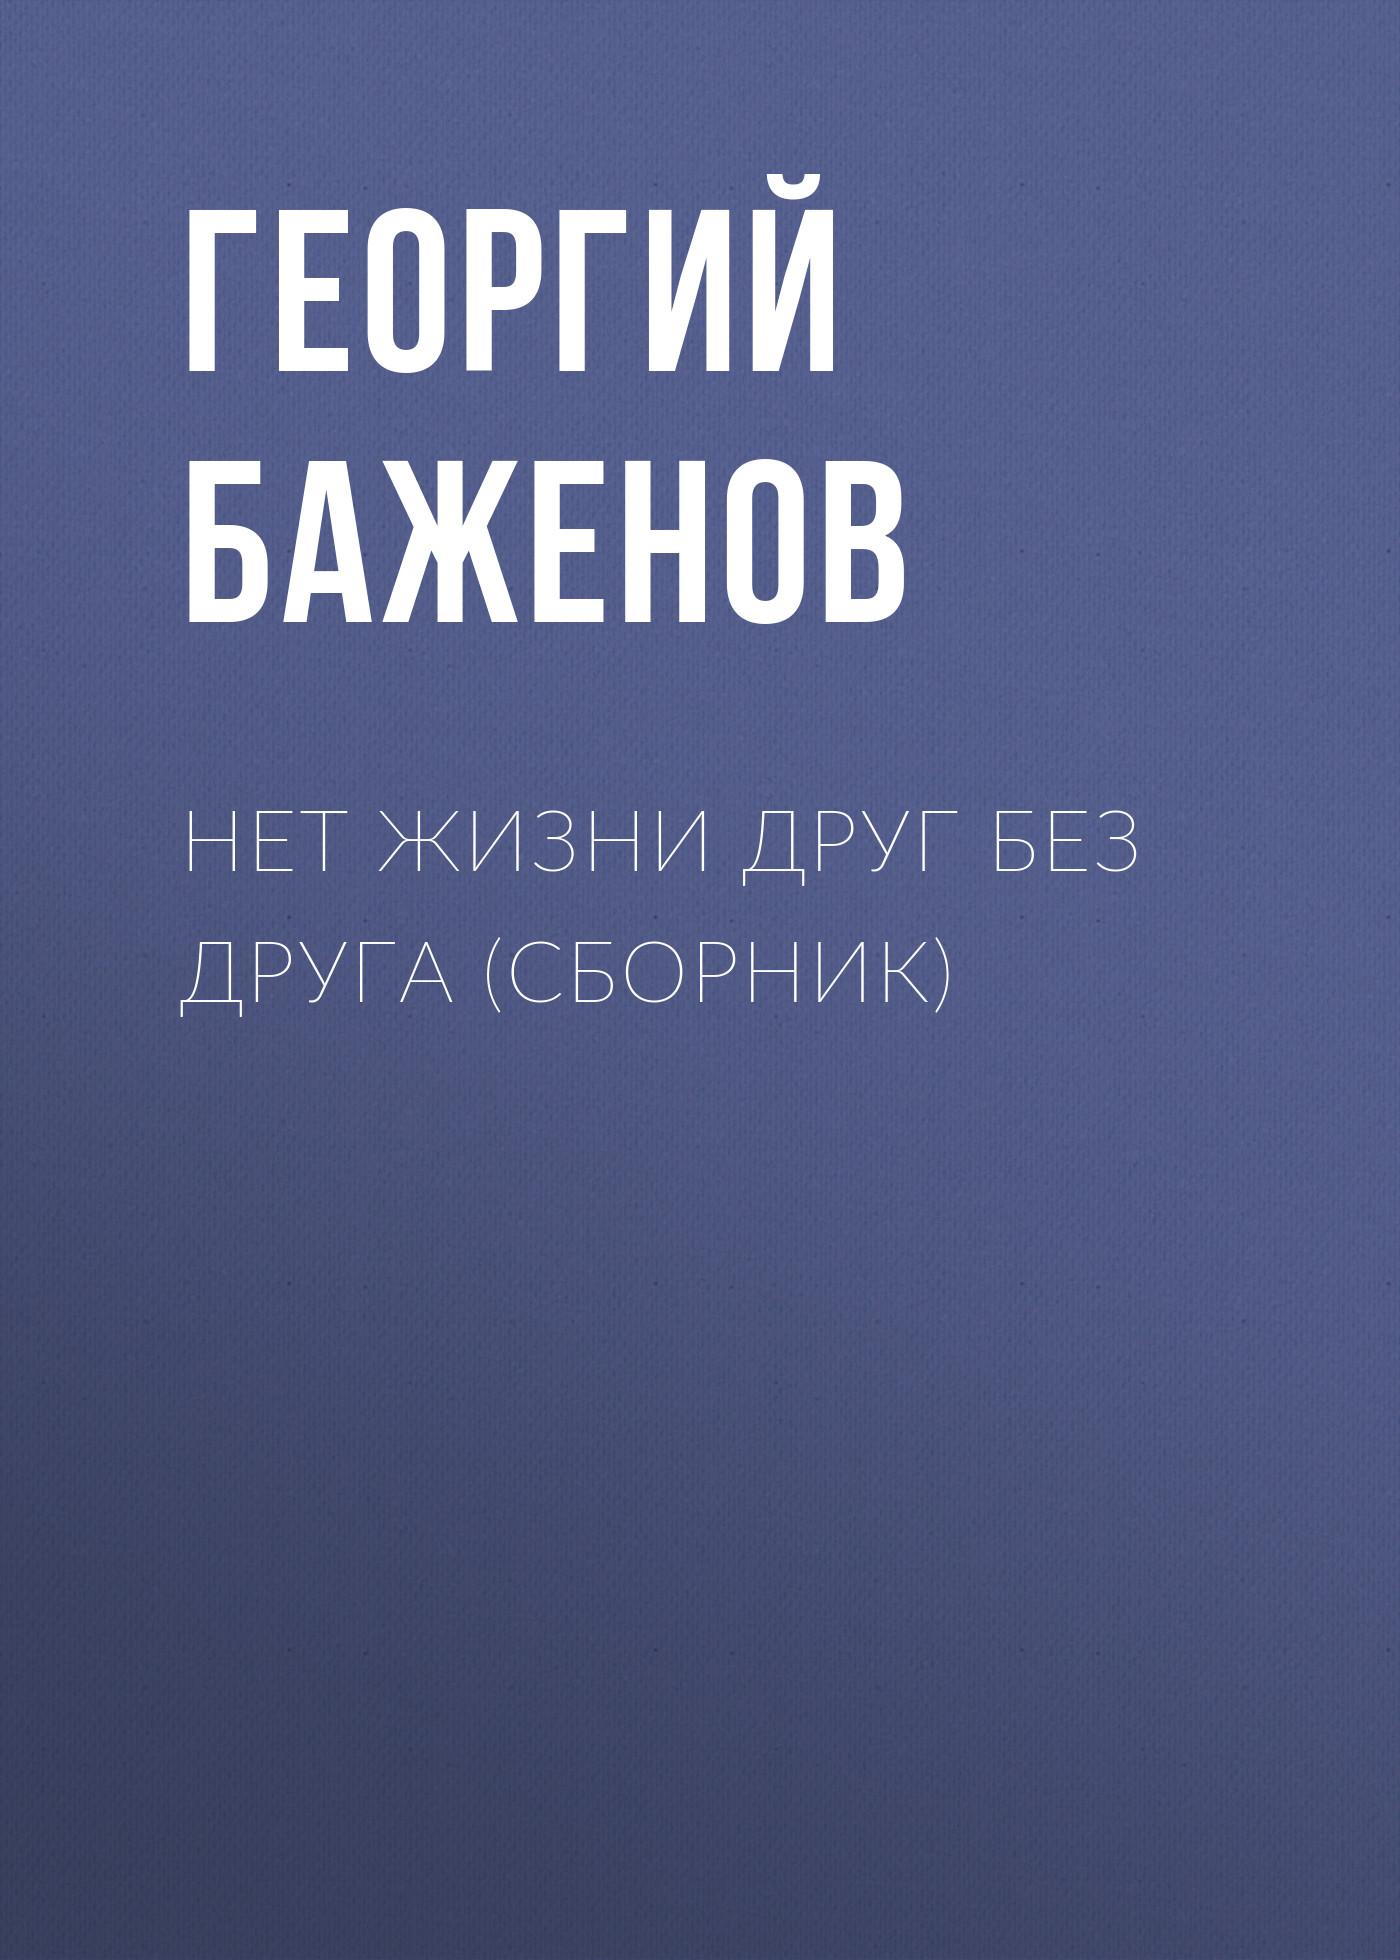 Георгий Баженов Нет жизни друг без друга (сборник) баженов георгий похищение любви